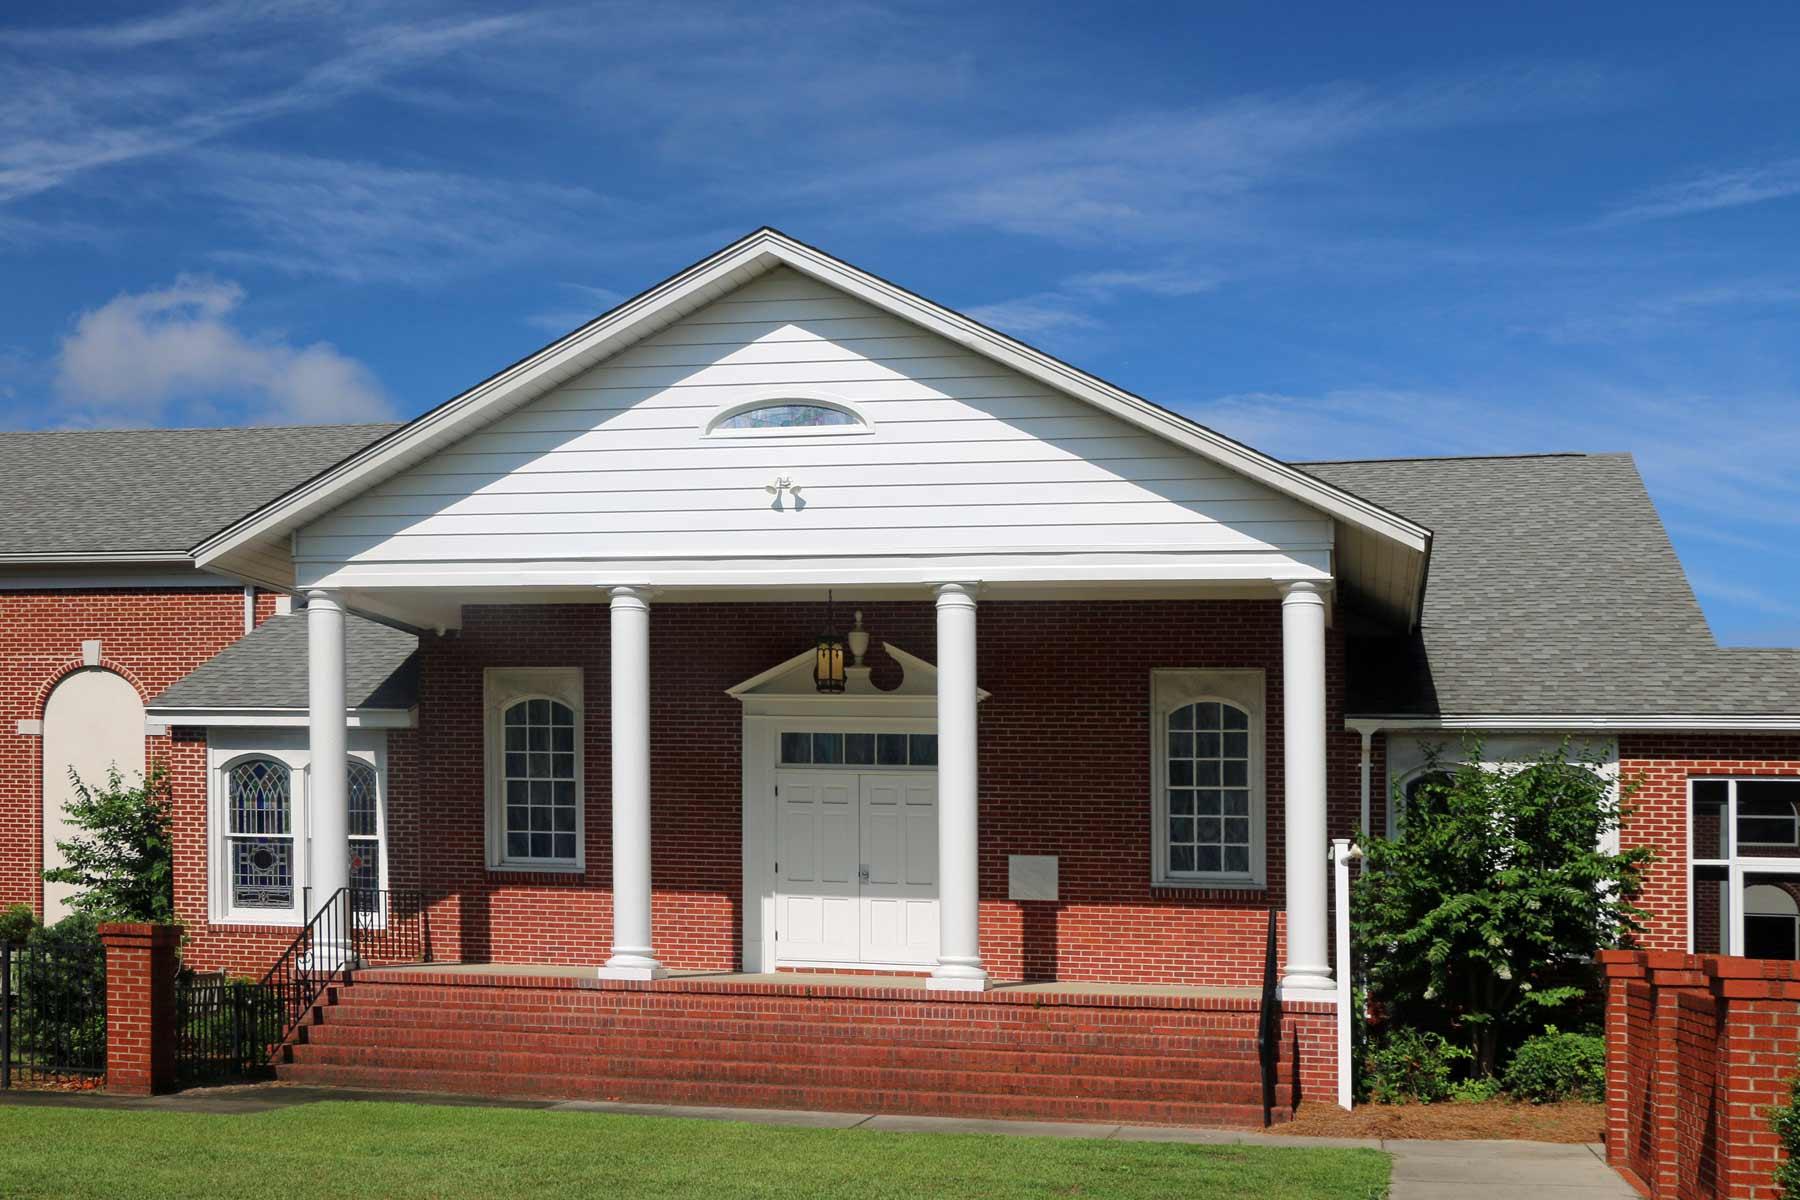 Kelleytown Baptist in Hartsville